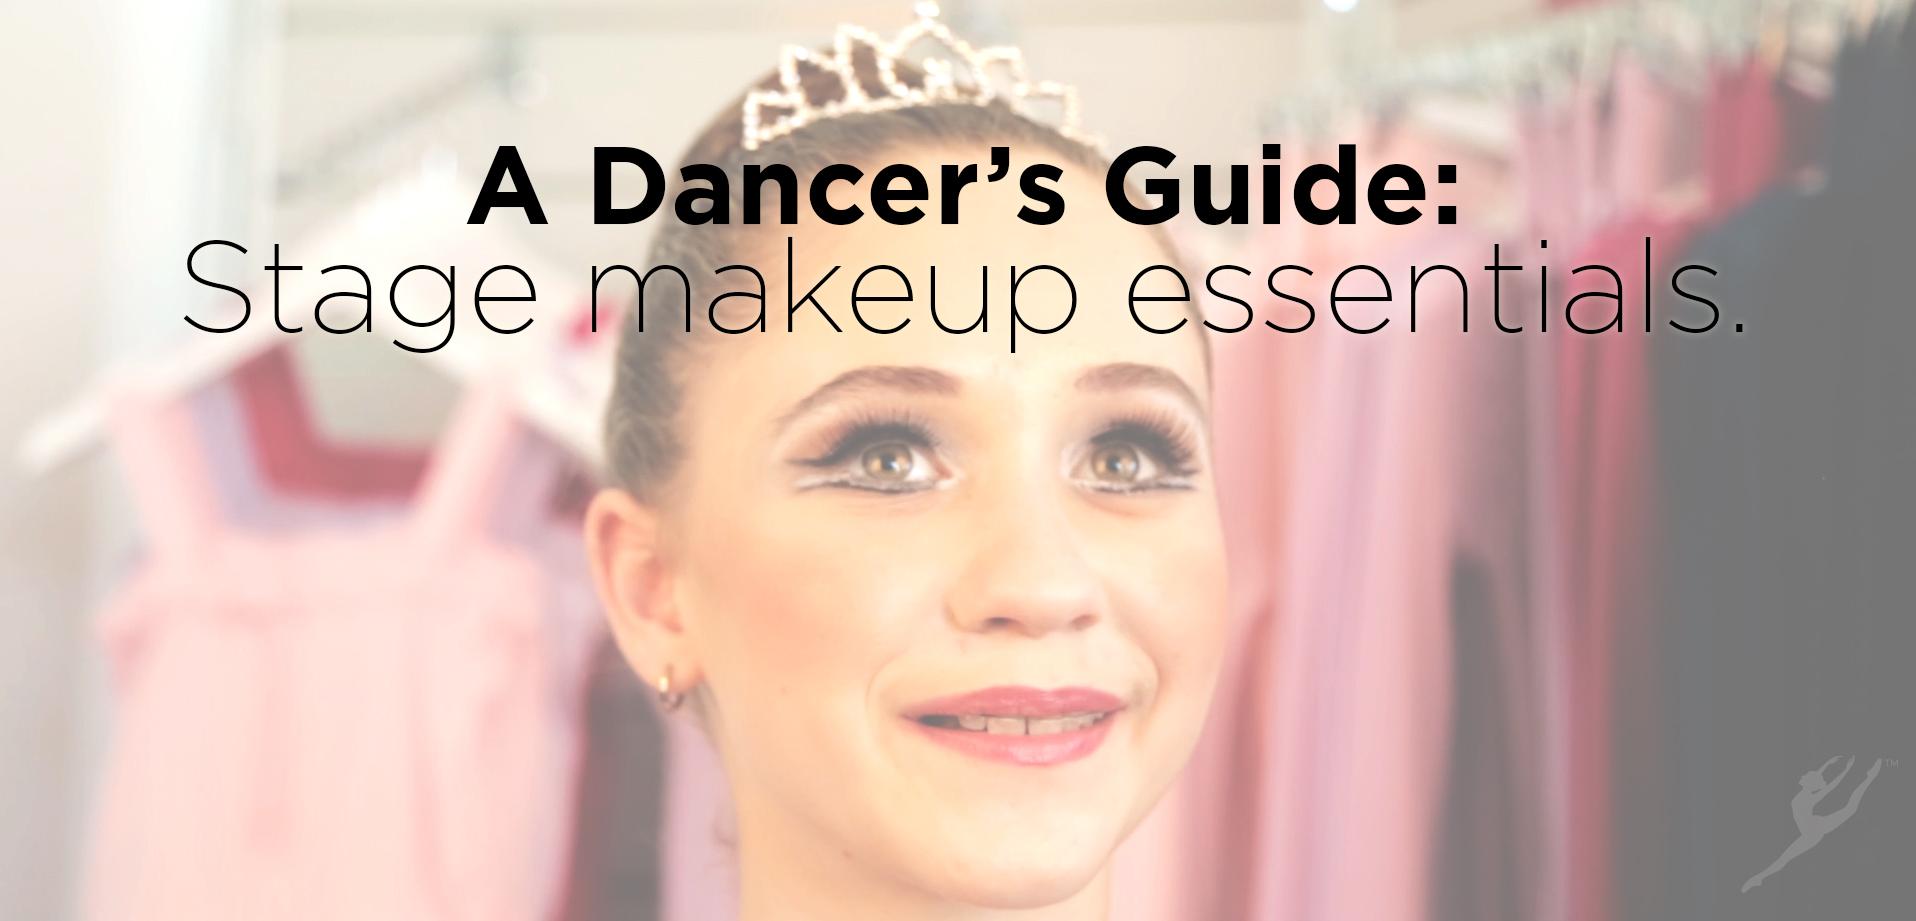 A Dancer's Guide: Stage makeup essentials — A Dancer's Life